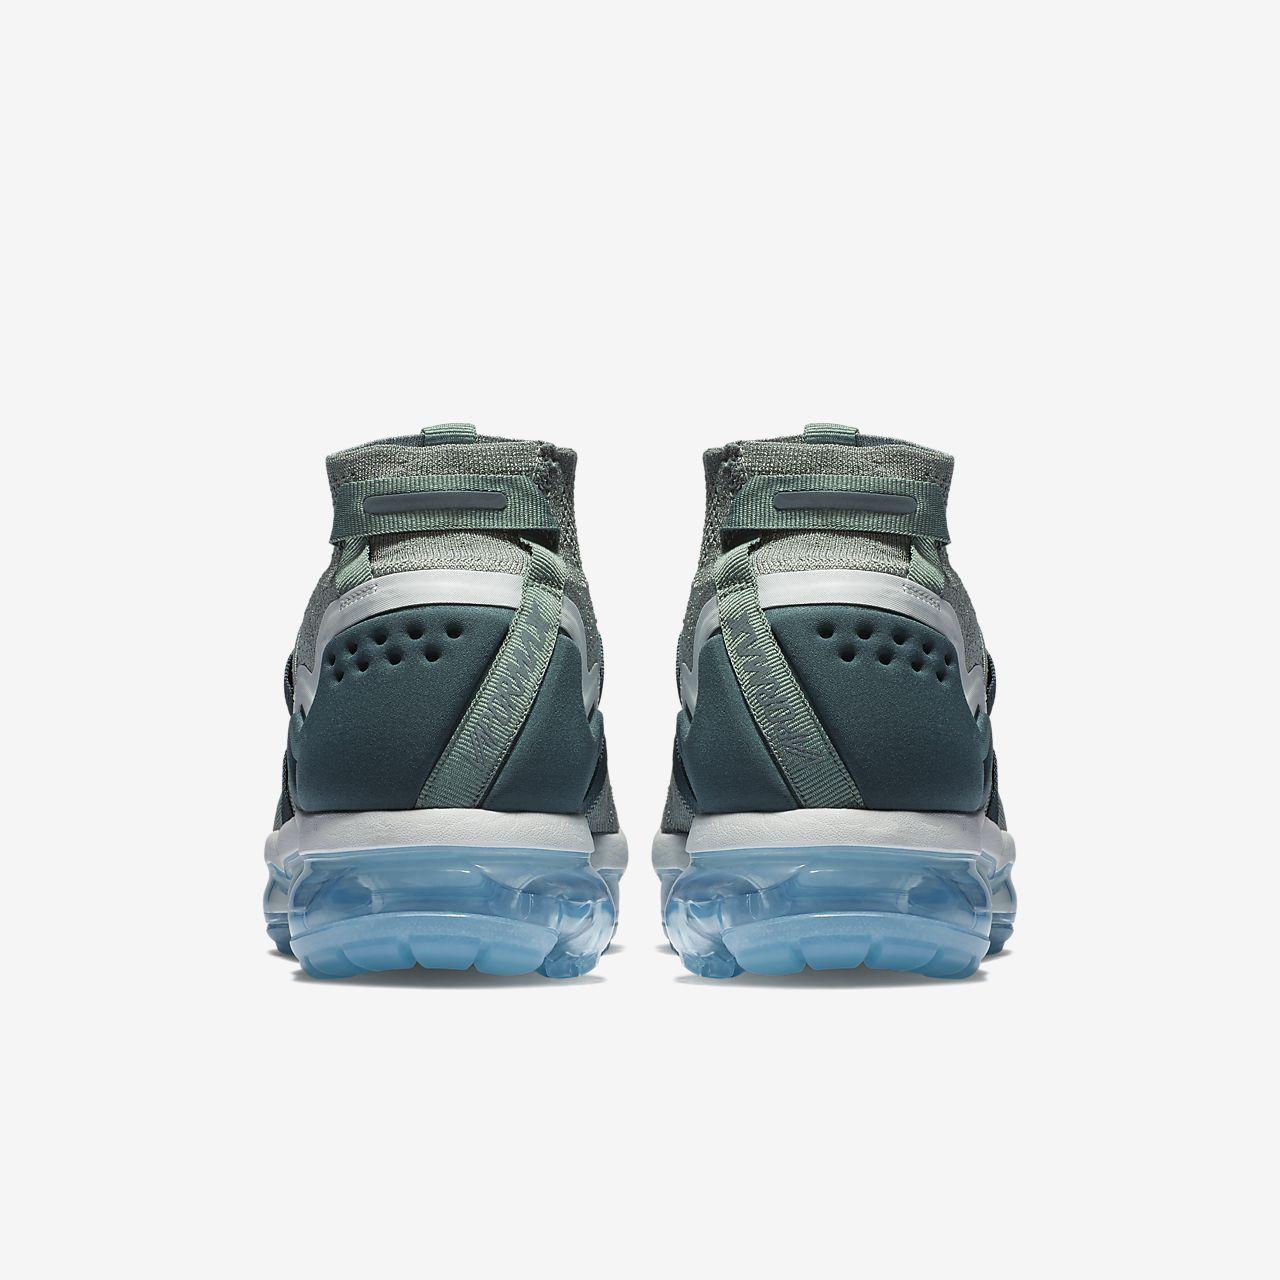 84325d87f760 Nike Air VaporMax Flyknit Utility Shoe. Nike.com